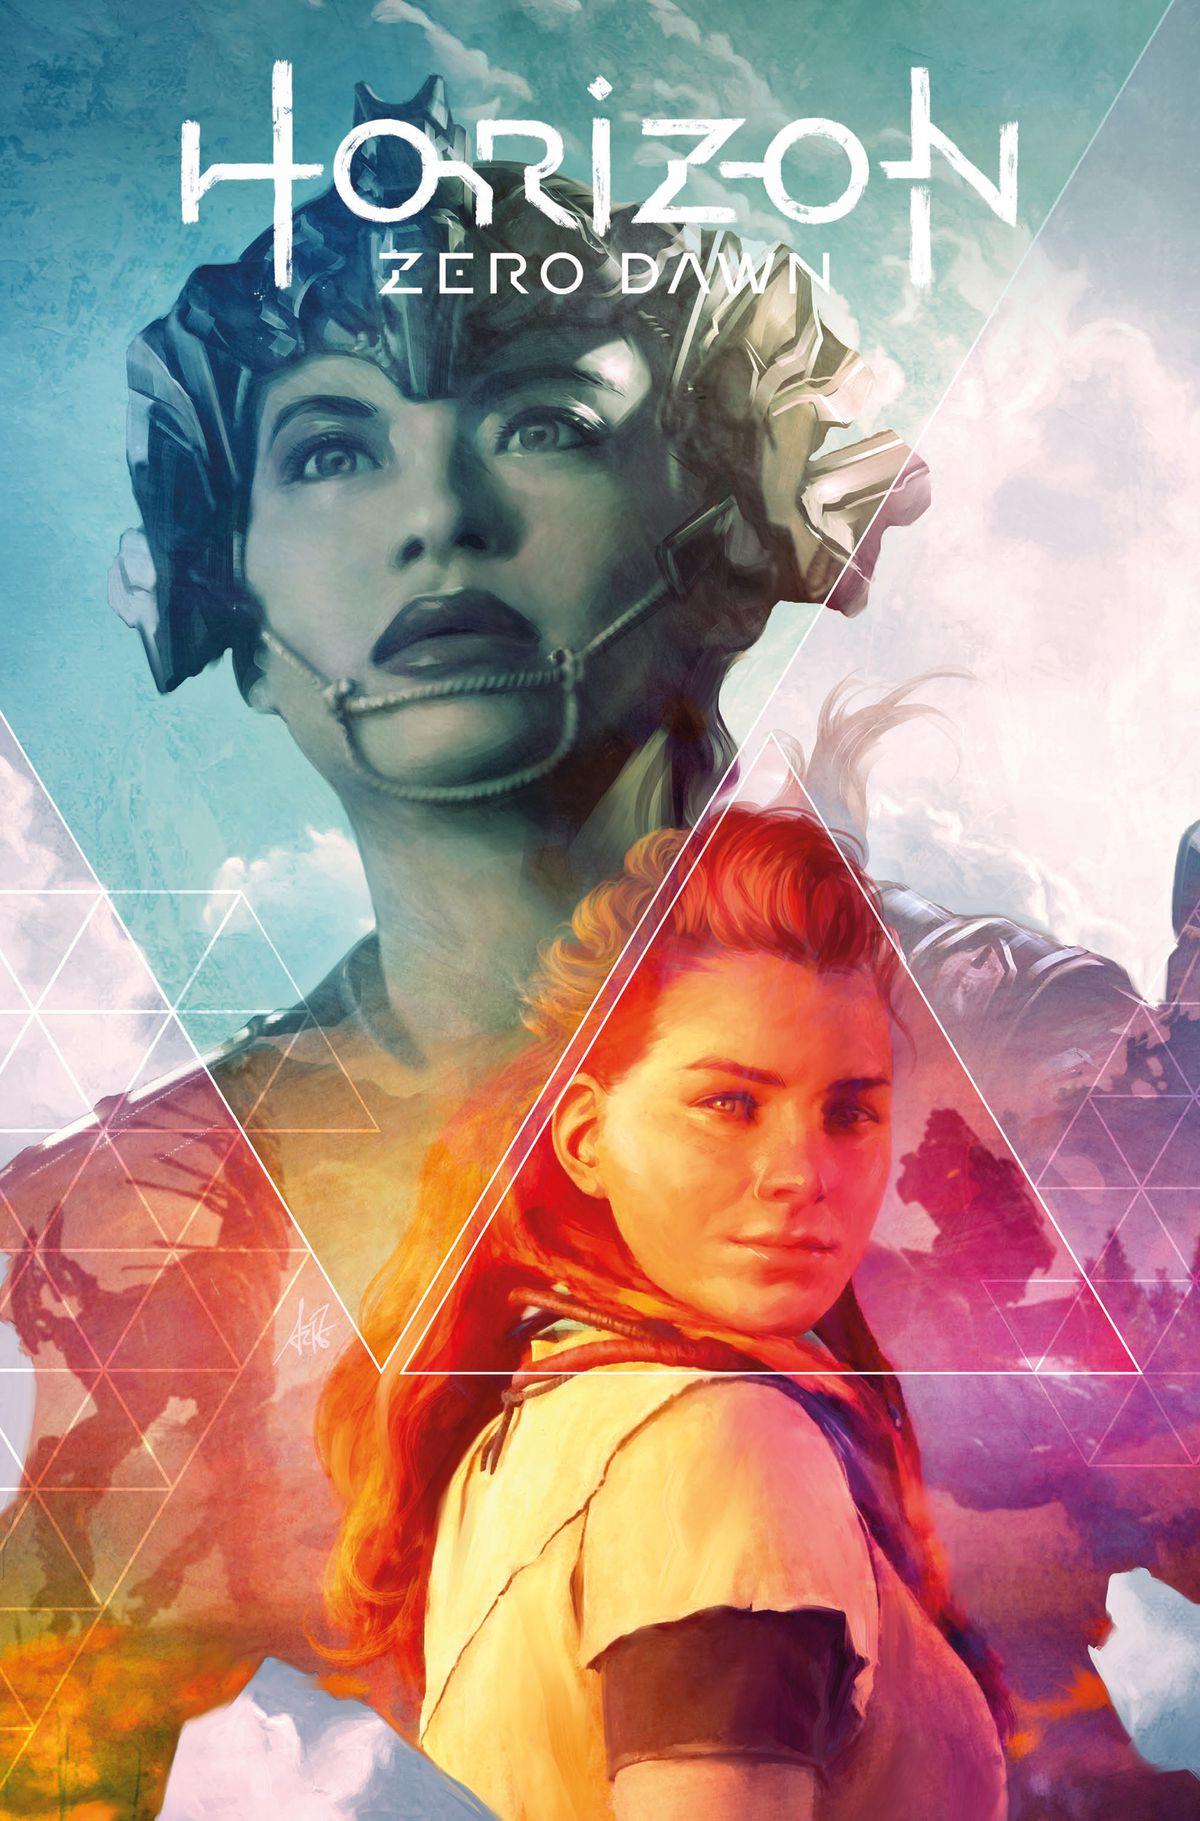 Cover of Horizon Zero Dawn #1, Titan Comics (2020) with Talanah and Aloy